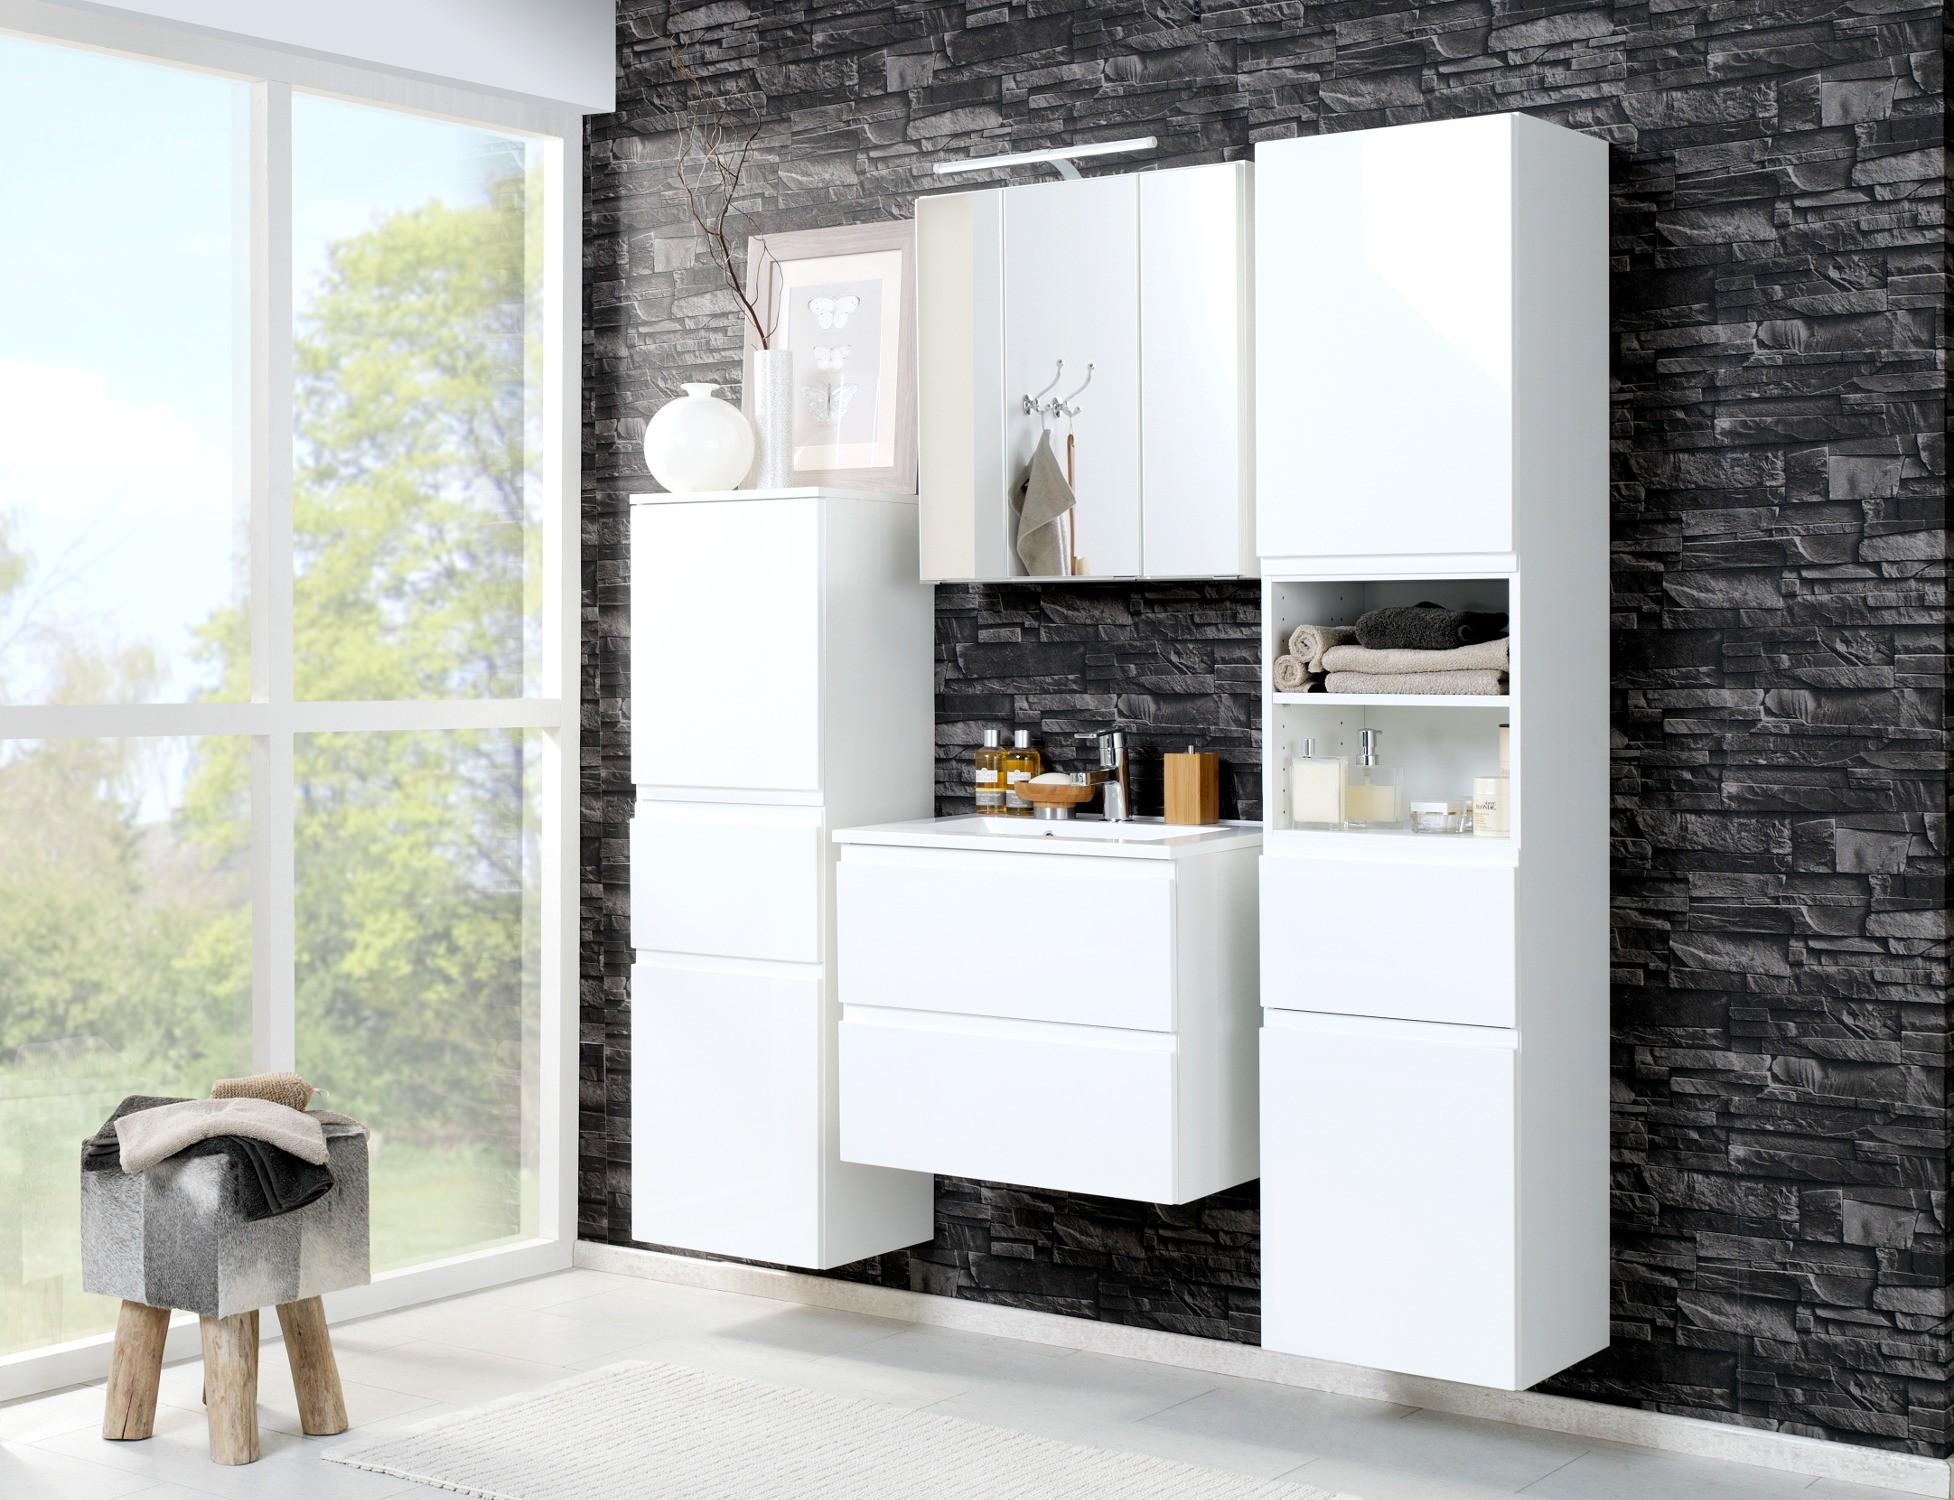 neu badezimmer badm belset cardiff 6 teiliges waschtisch badset weiss ebay. Black Bedroom Furniture Sets. Home Design Ideas